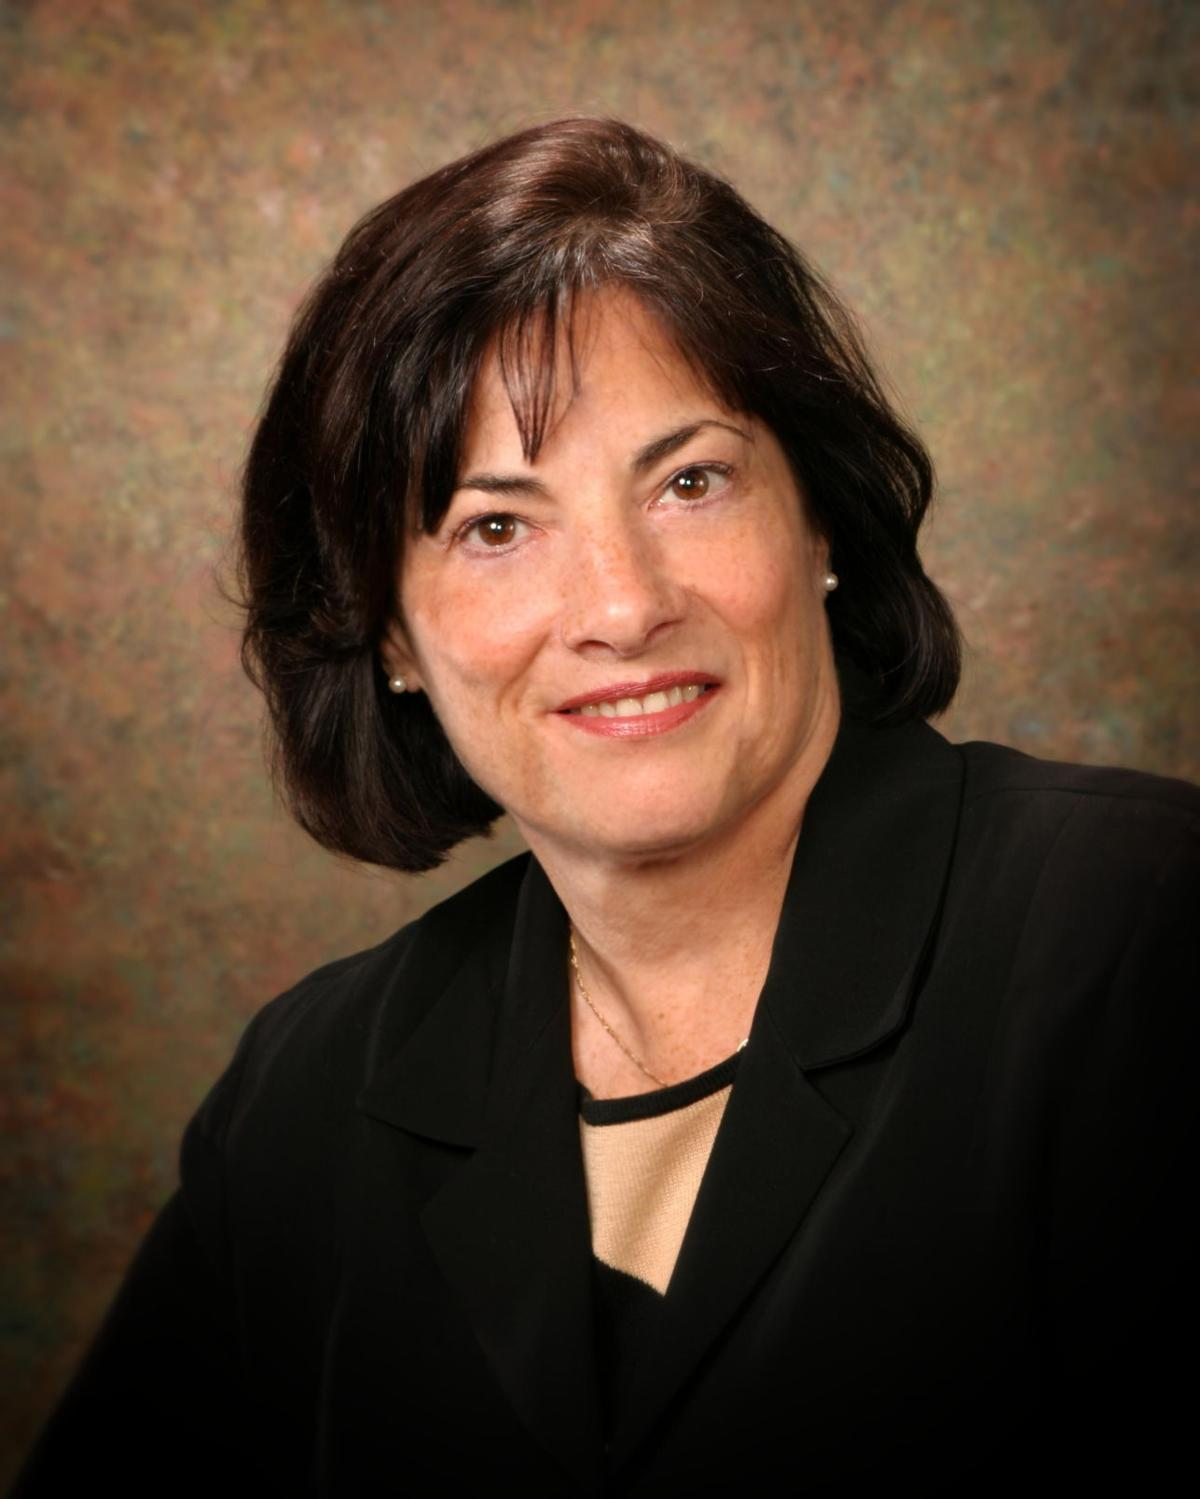 Peggy Garr